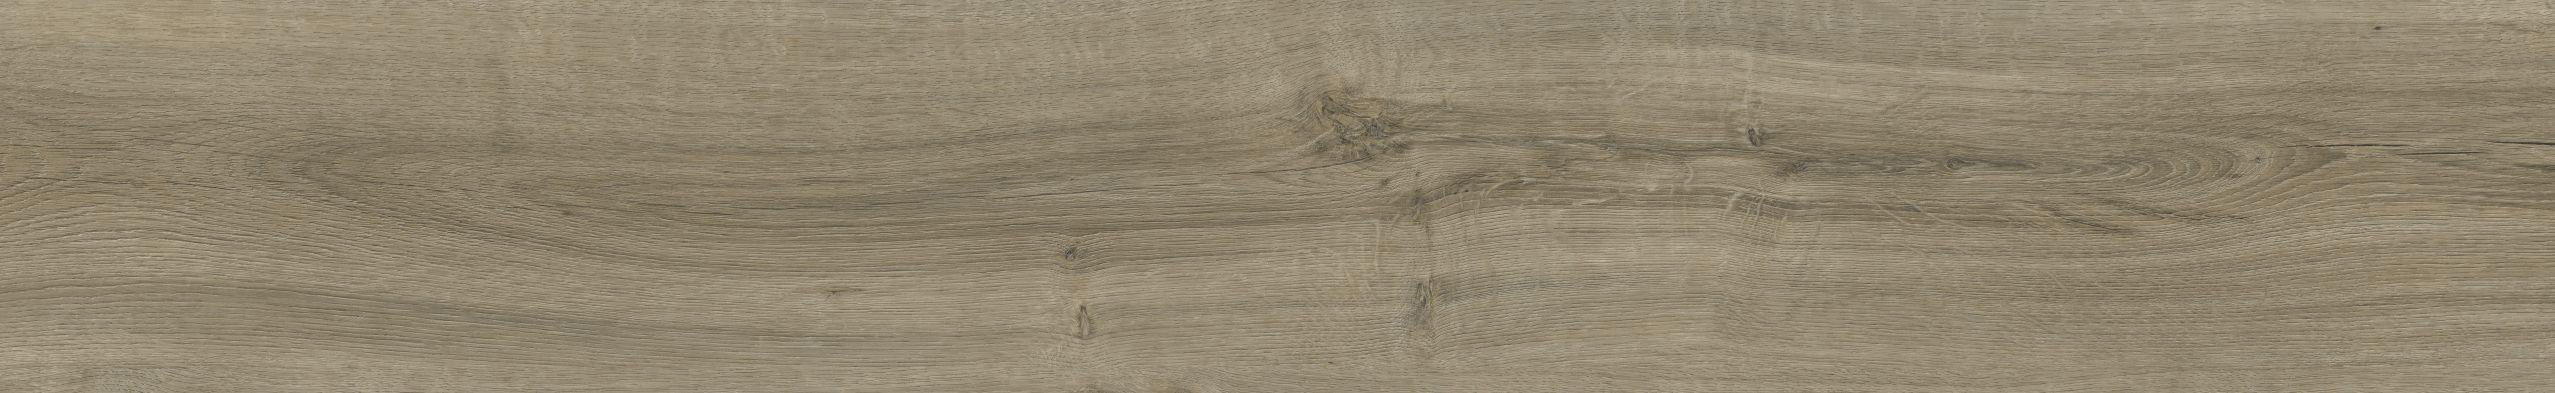 Panele winylowe LVT modulari ® WOOD DRYBACK 19,6 x 132 cm 24933